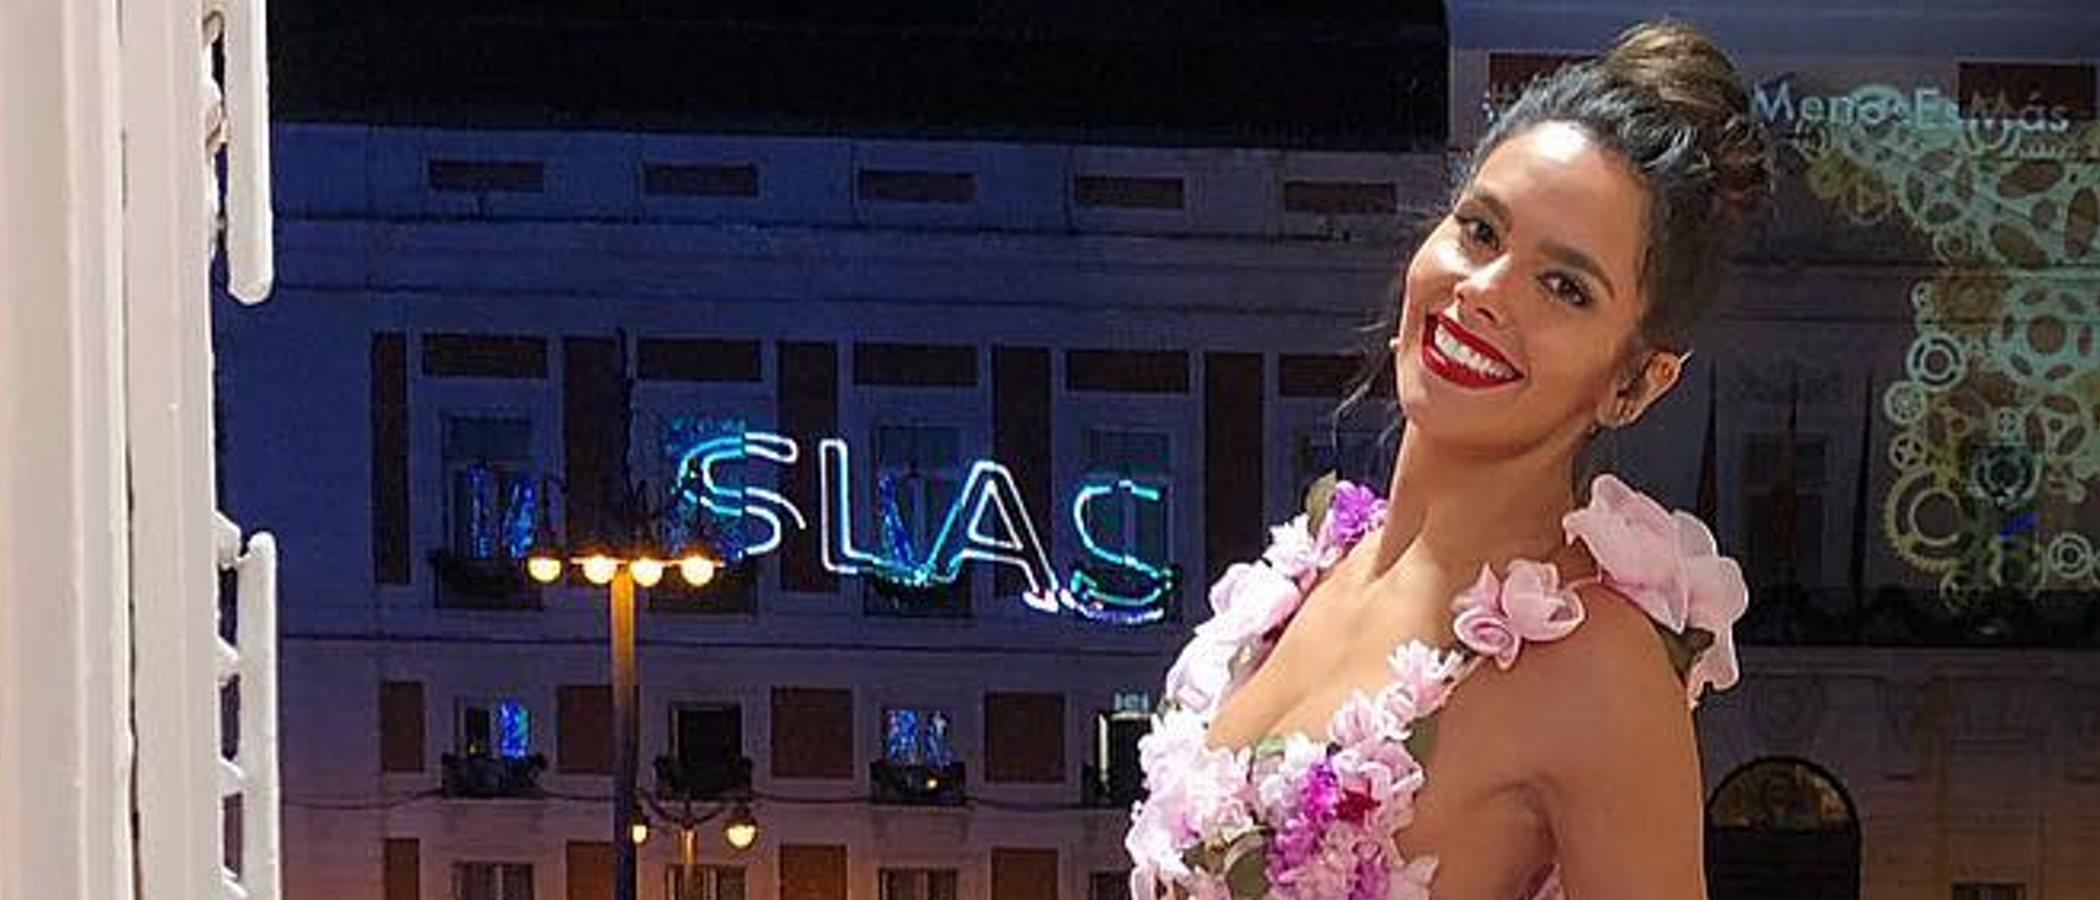 De la elegancia de Lara Álvarez y el rojo de Anne Igartiburu al 'bikini' de Pedroche en las Campanadas 2018